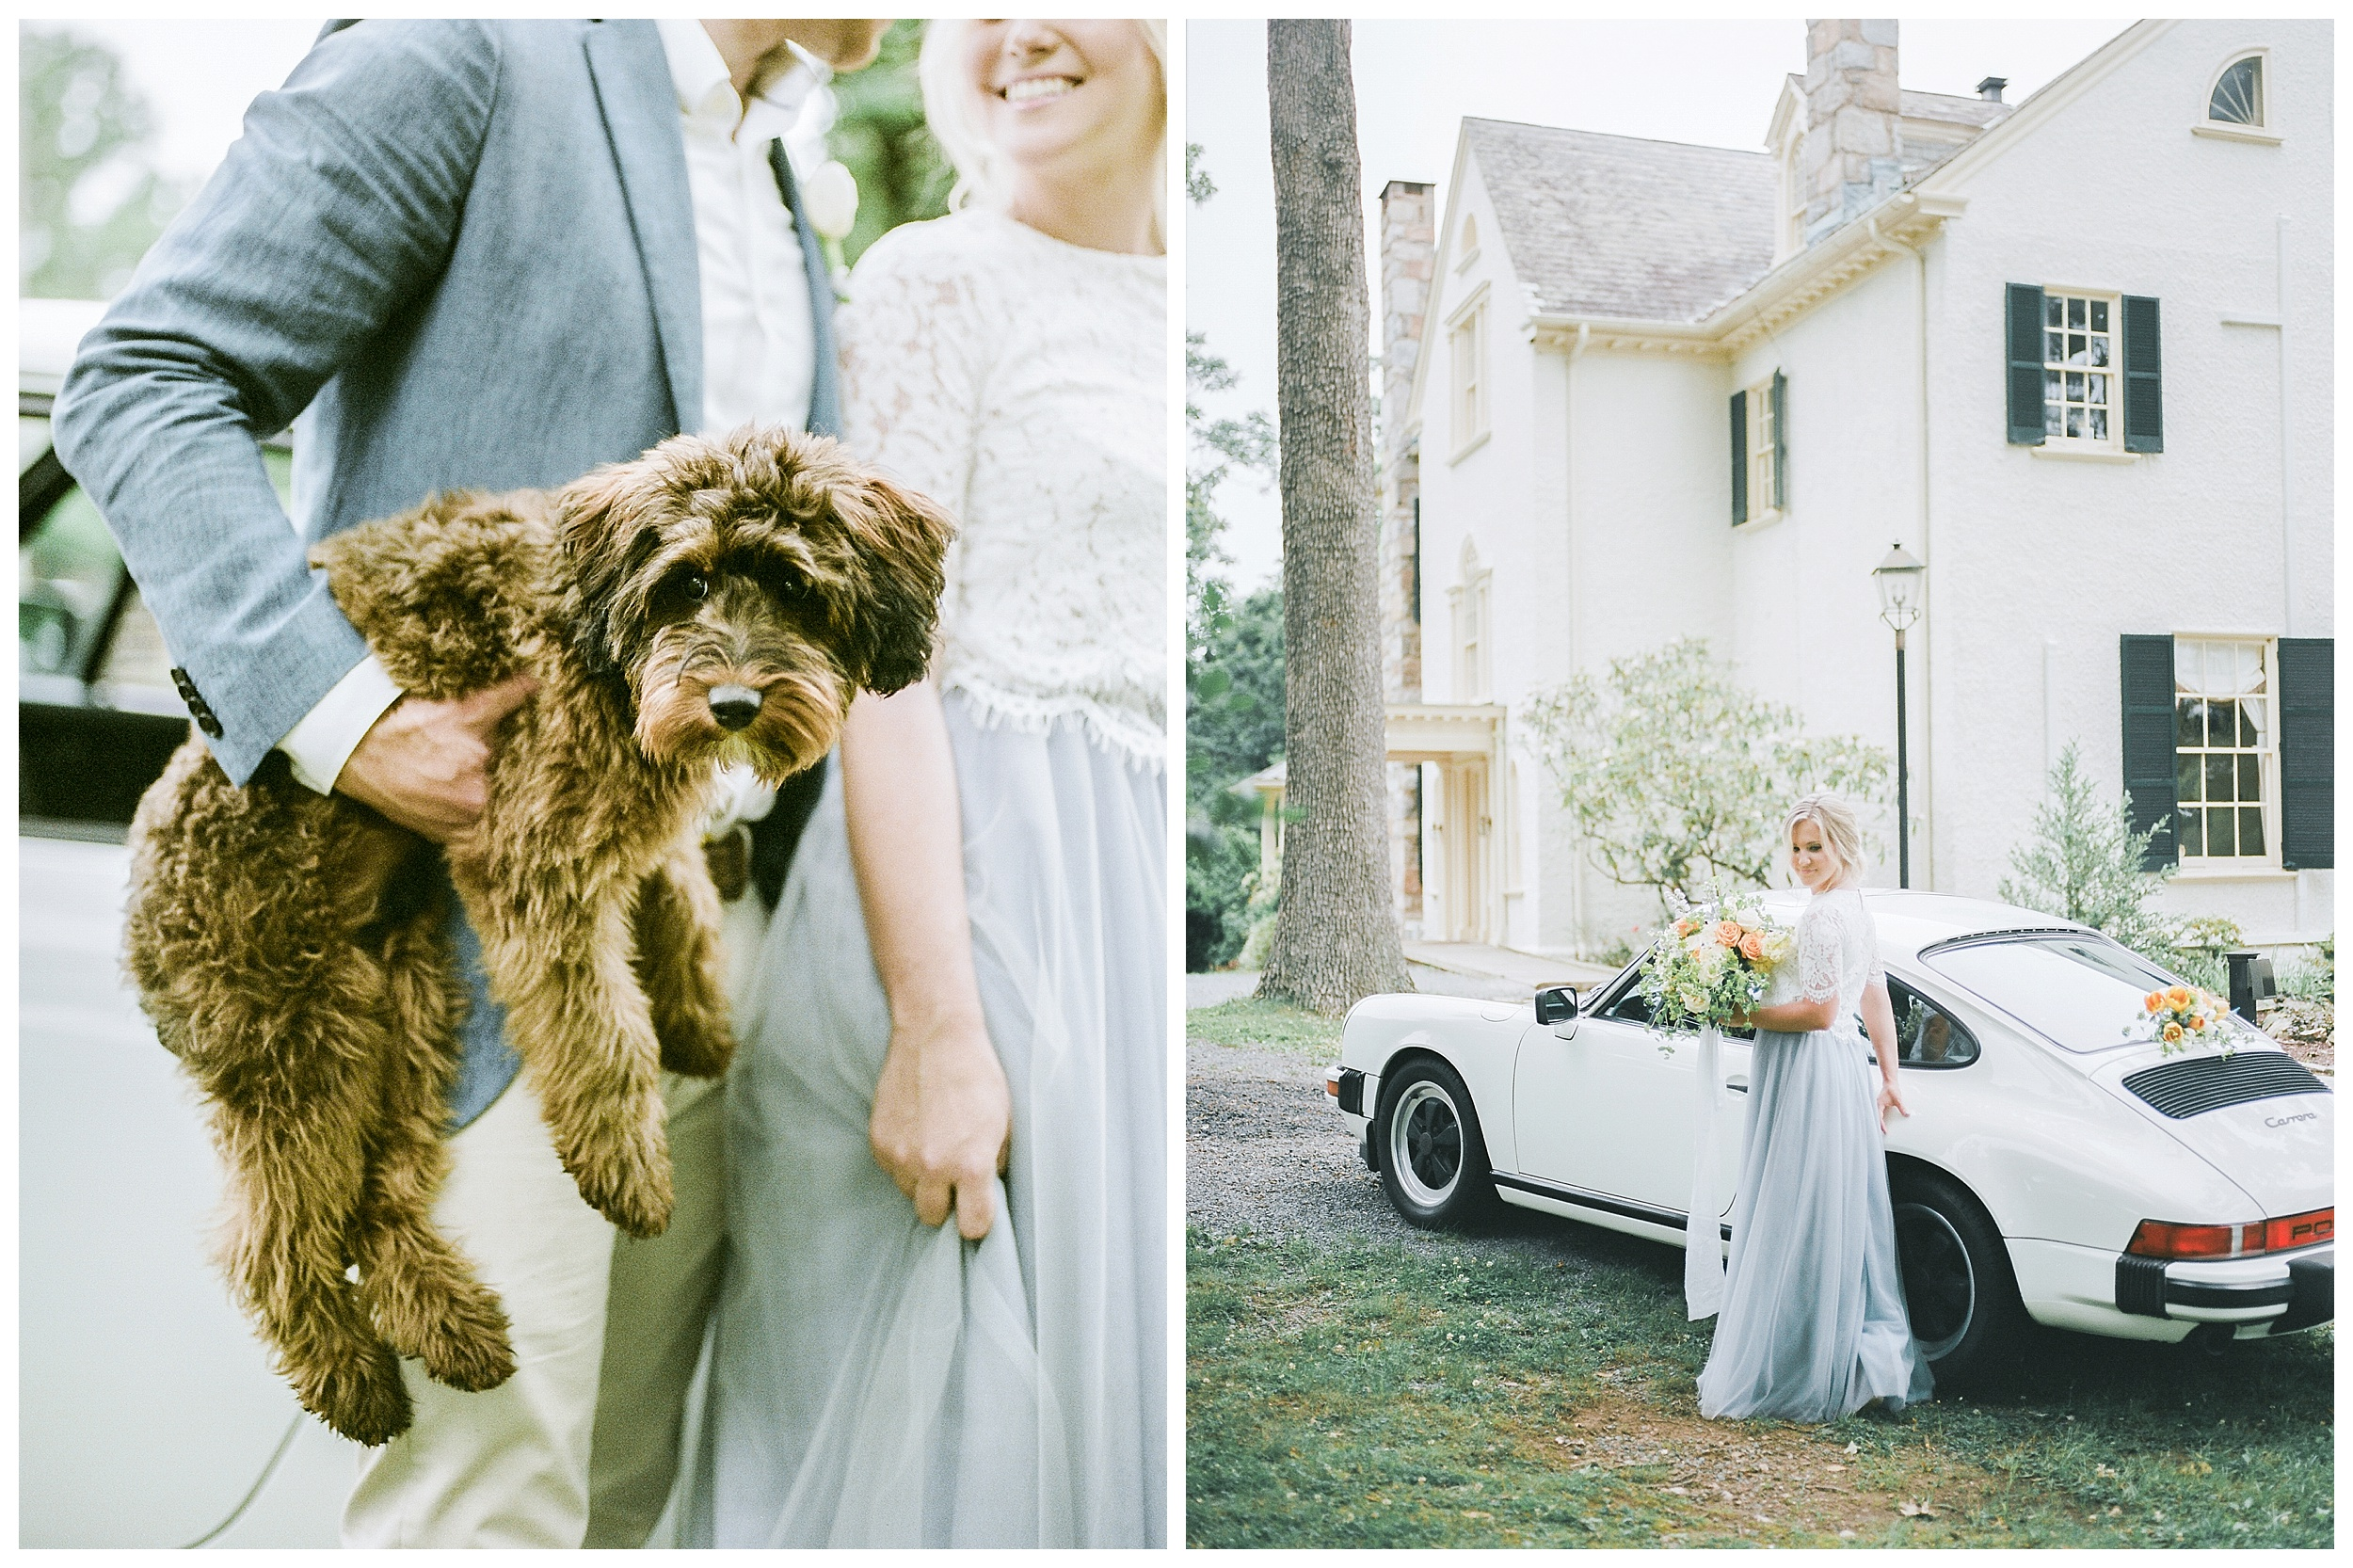 Rust Manor Wedding   Virginia Wedding Photographer Kir Tuben_0021.jpg